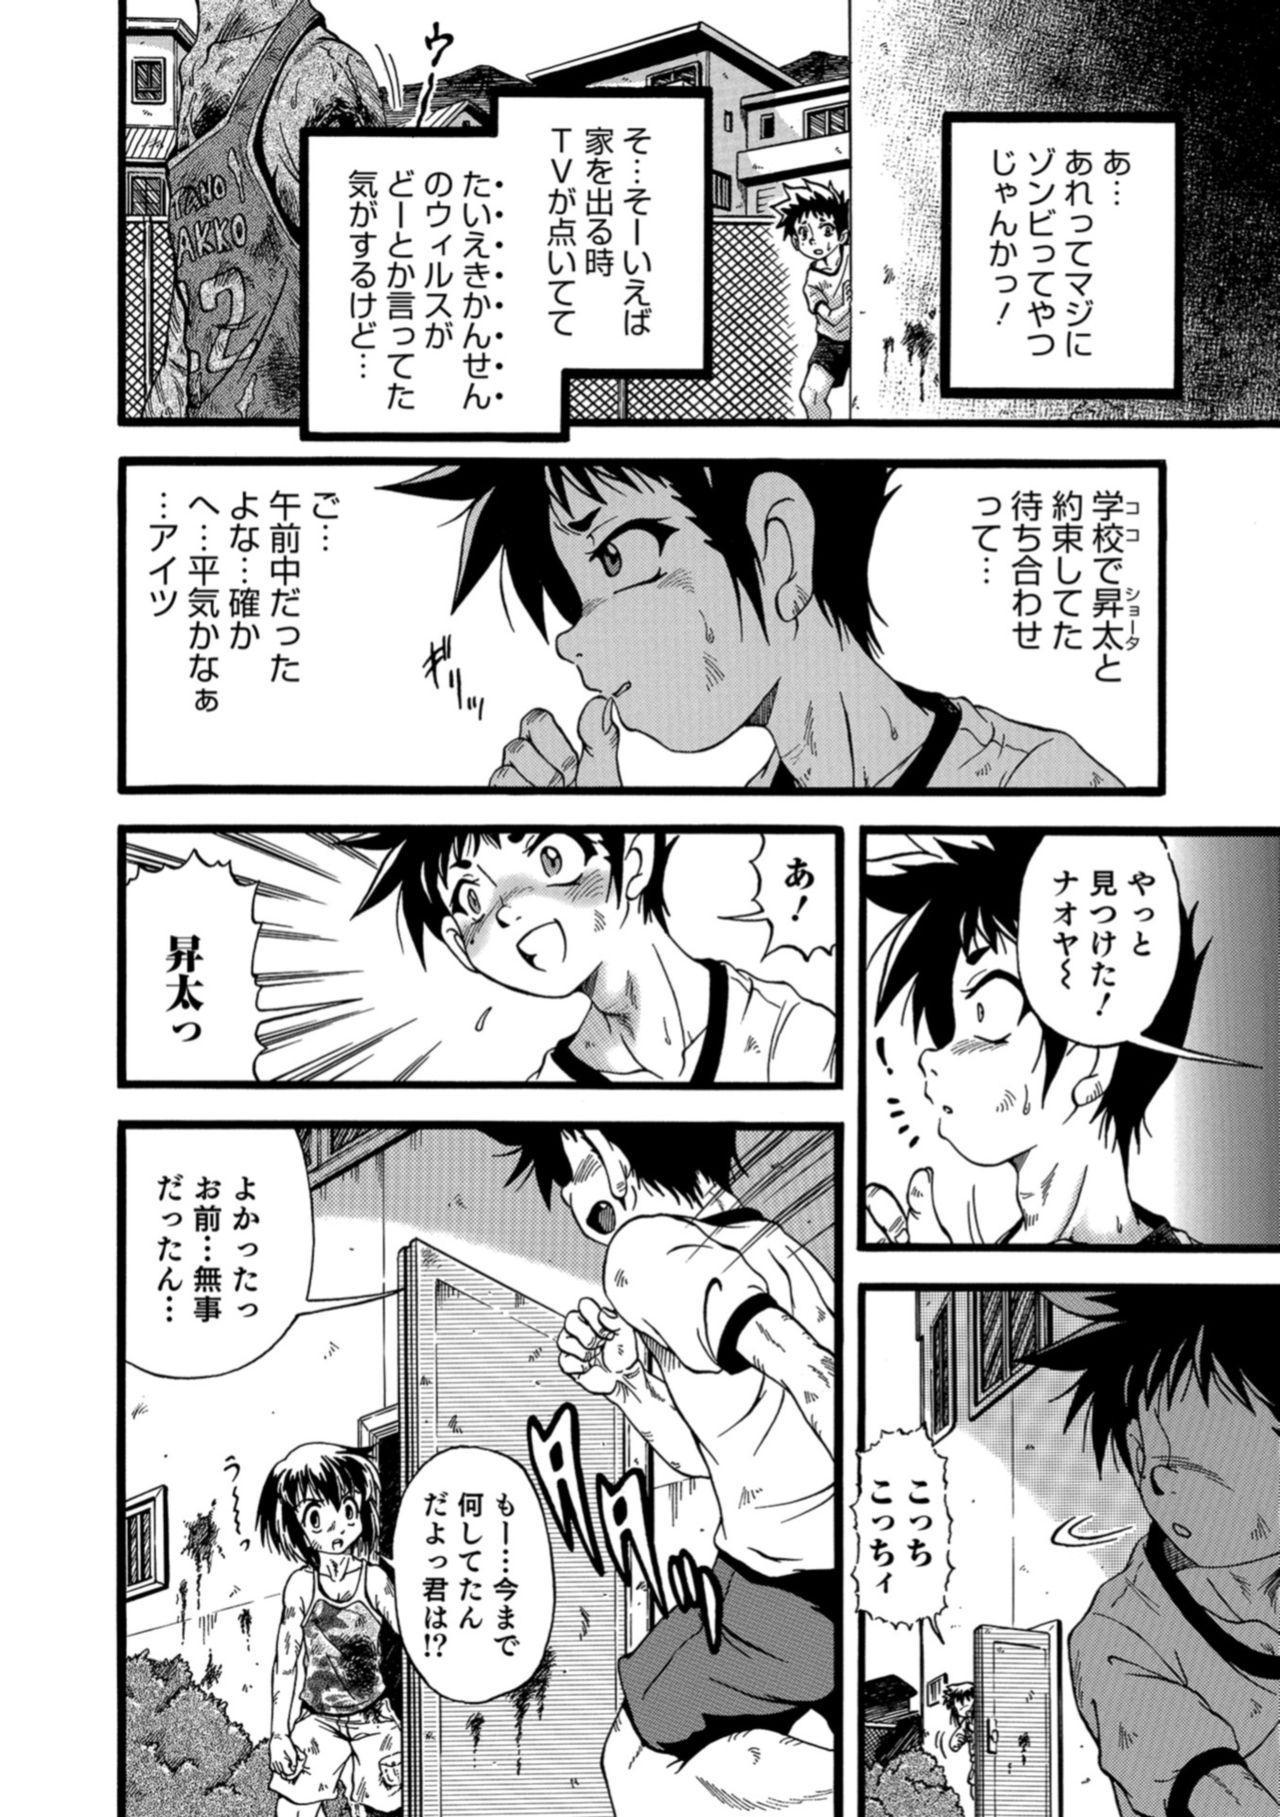 Otokonoko HELL'S GATE #03 155